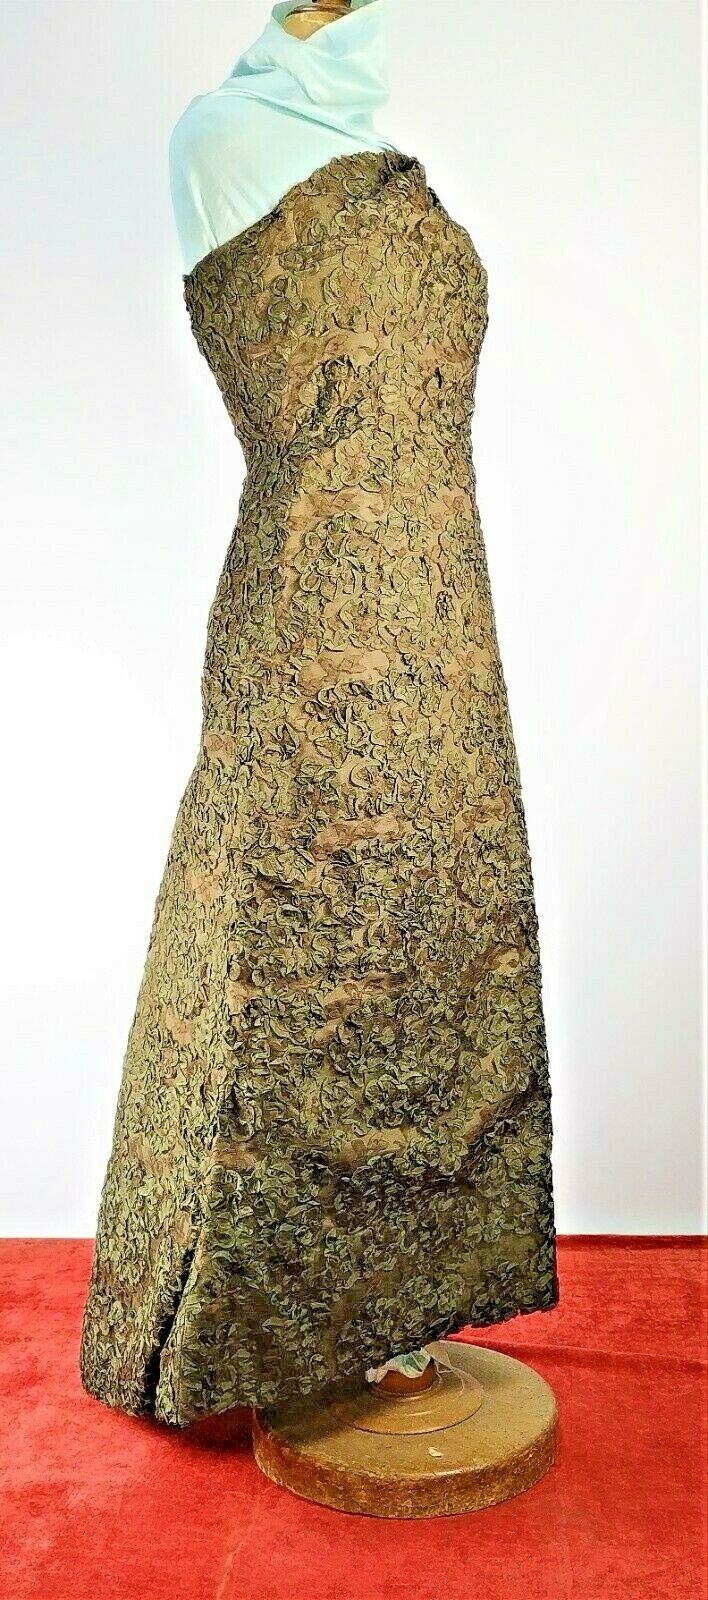 HAUTE COUTURE DRESS. SILK TAFFETA. LACE. VINTAGE. SPAIN. CIRCA 1950